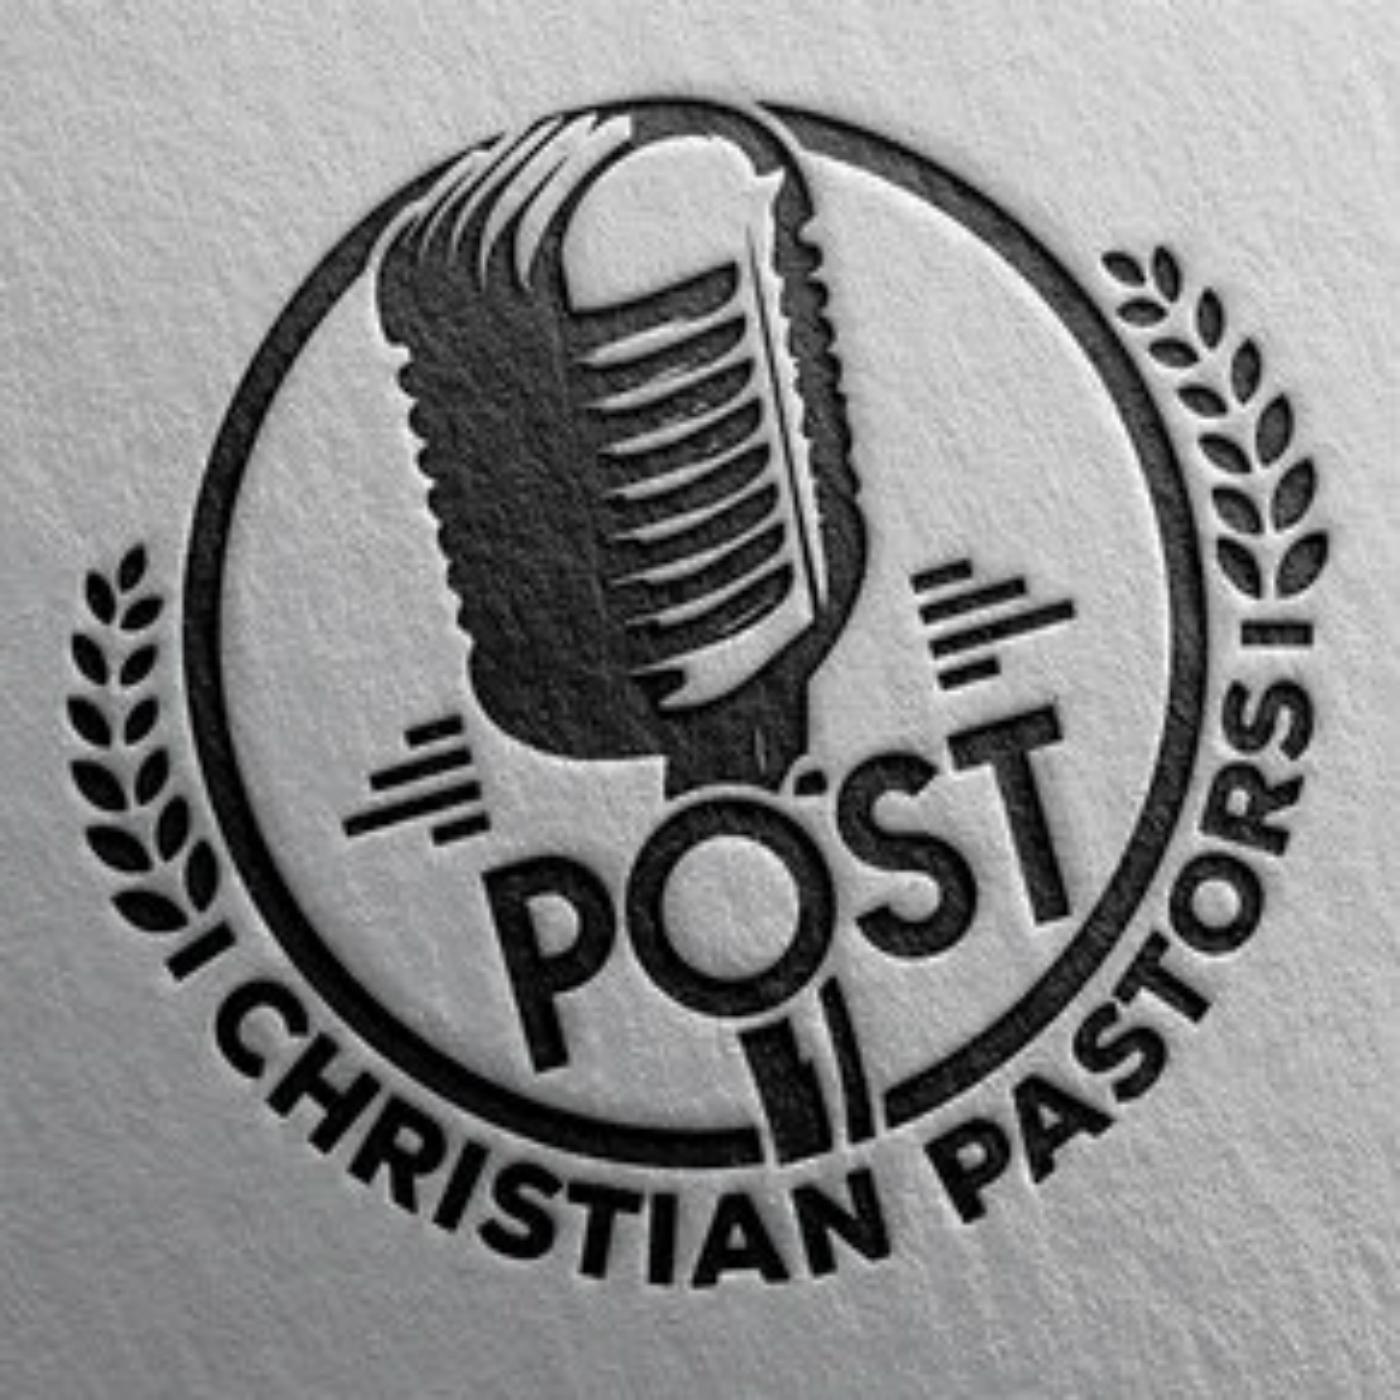 Post Christian Pastors